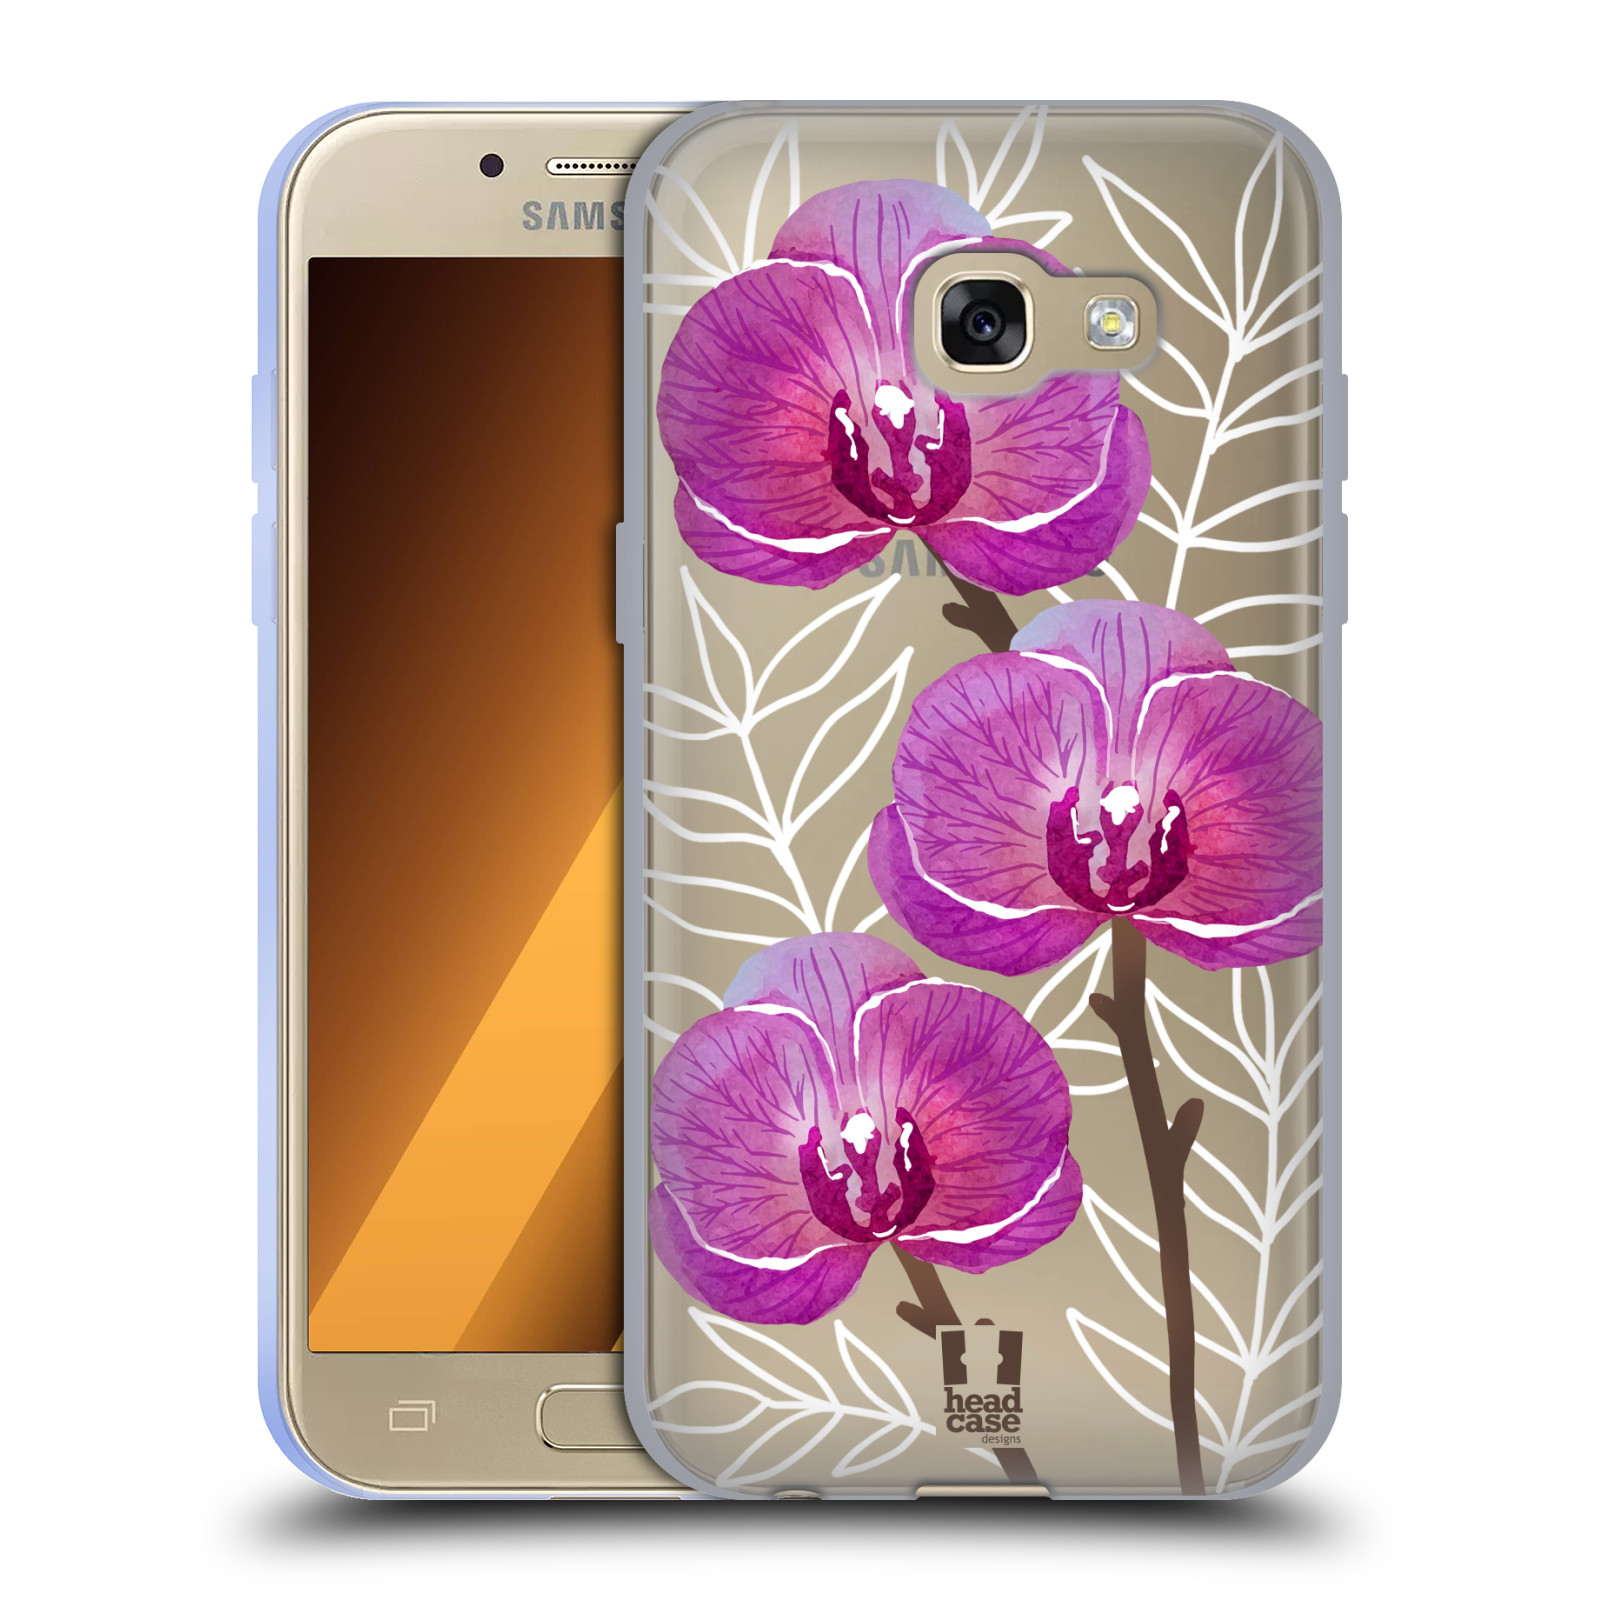 Silikonové pouzdro na mobil Samsung Galaxy A3 (2017) - Head Case - Hezoučké kvítky - průhledné